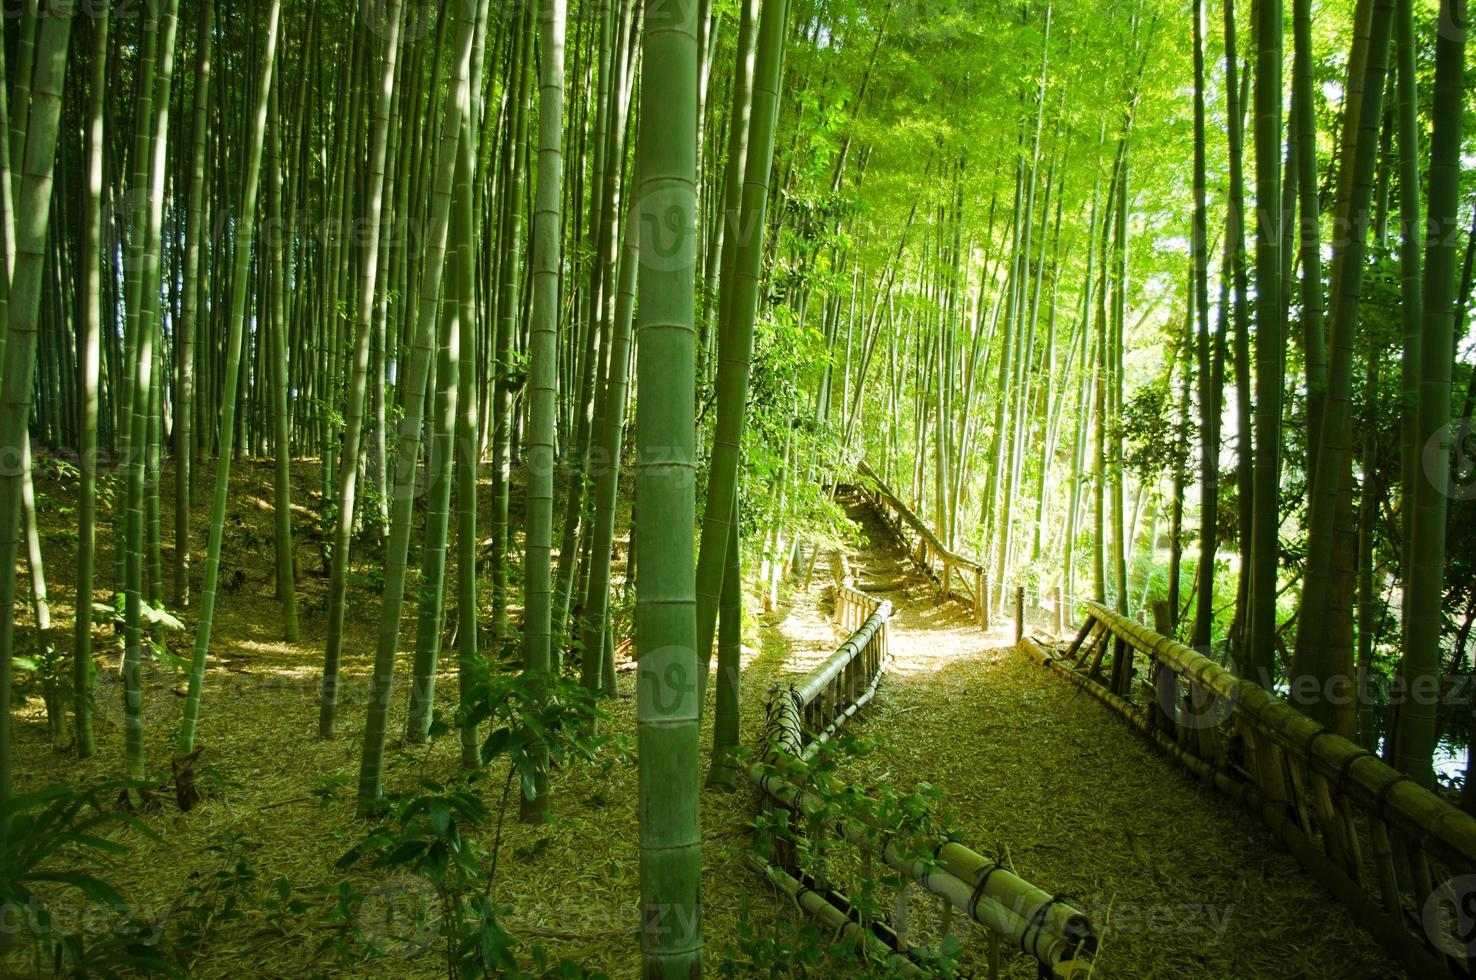 bamboe bos manier foto